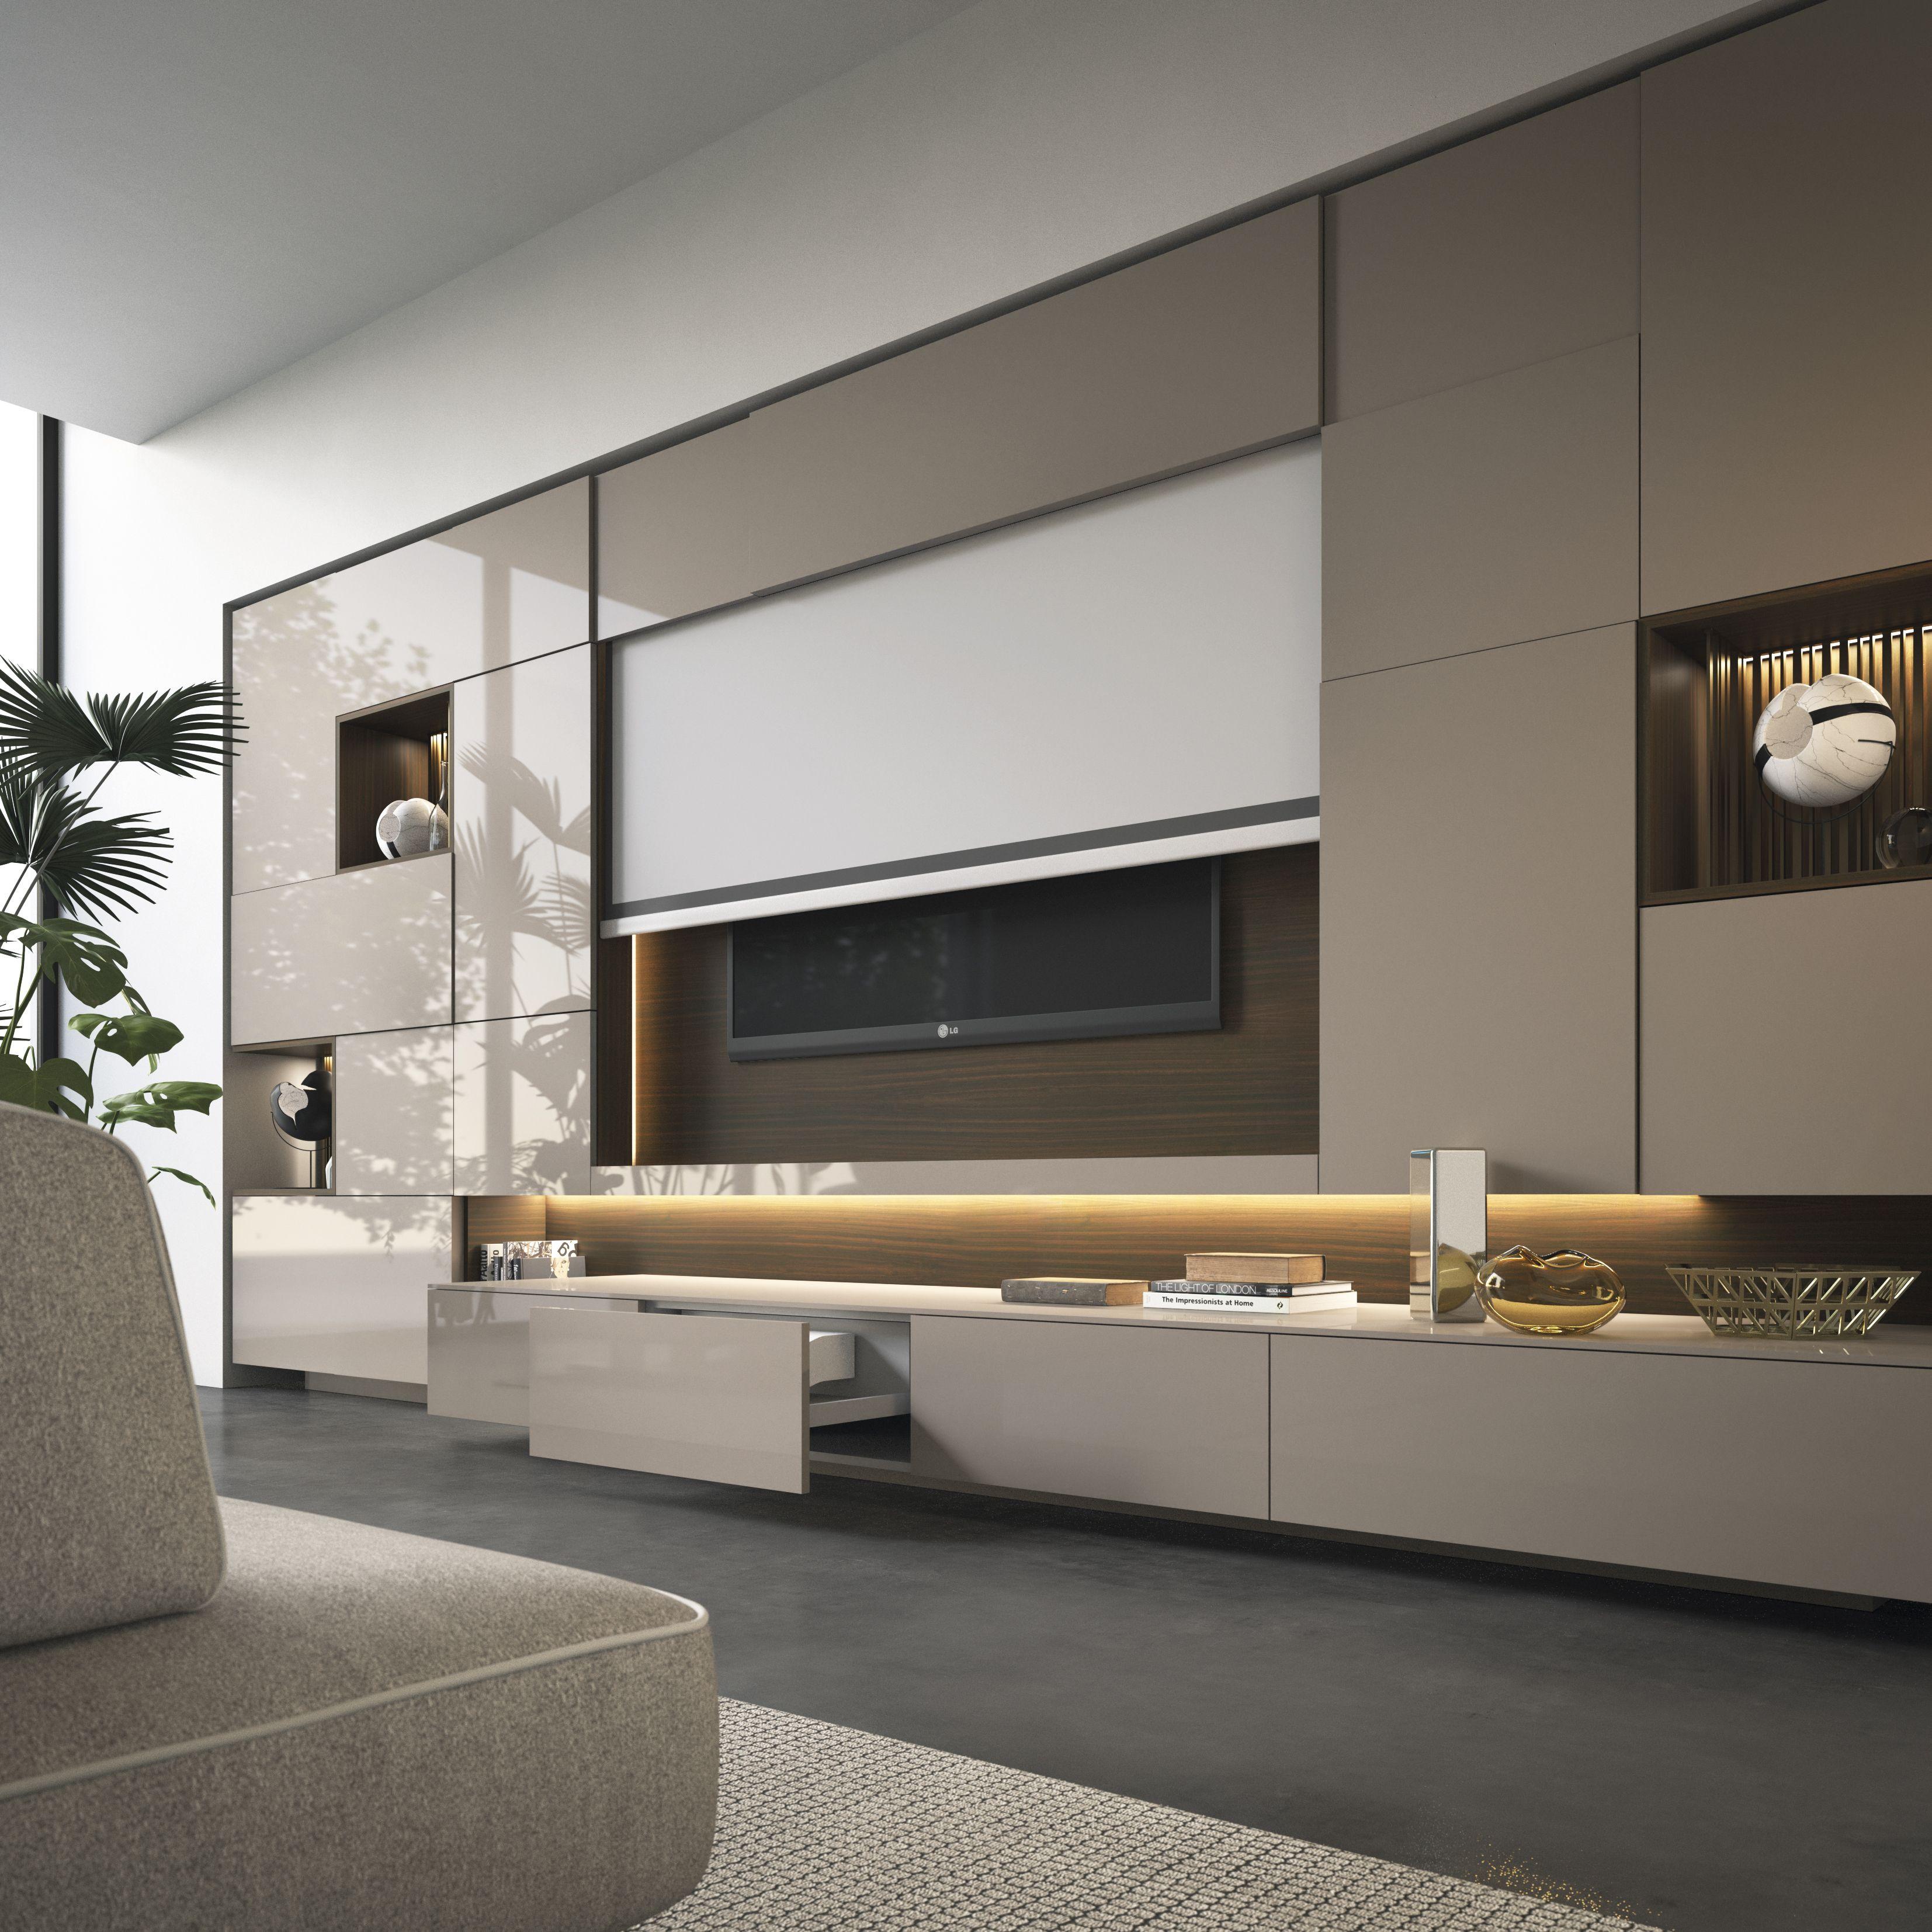 Boiserie Interior Design